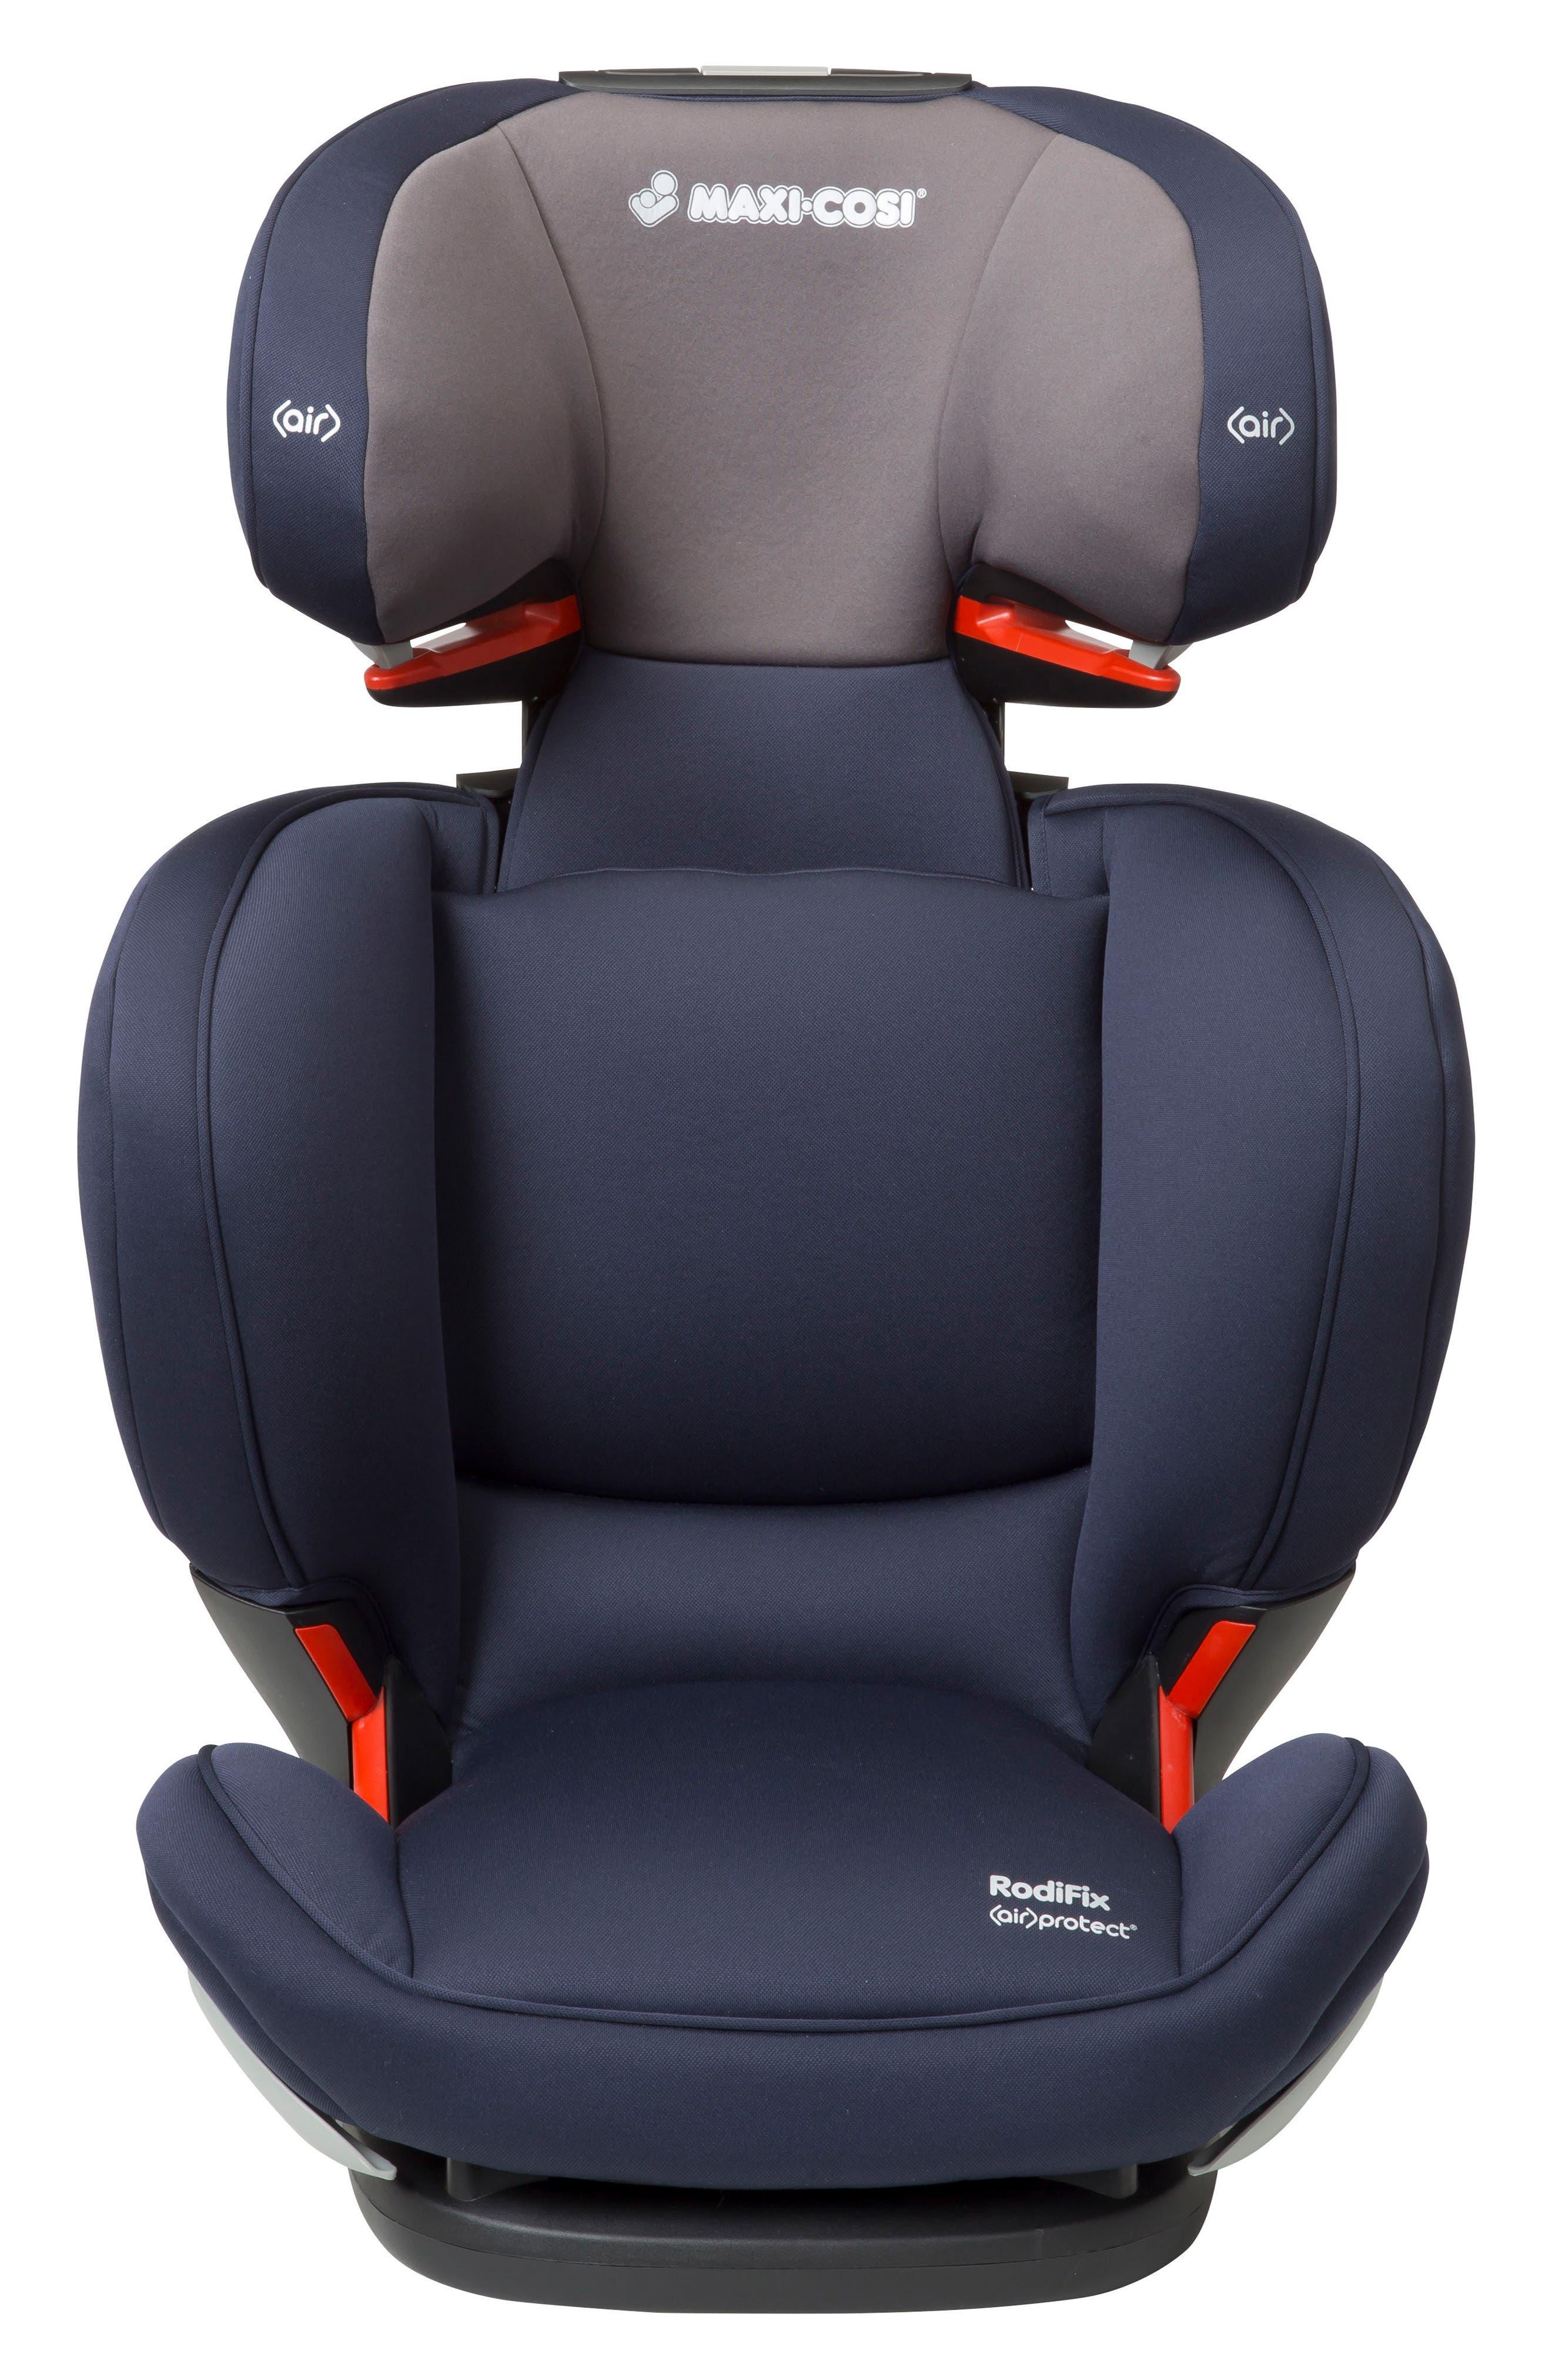 Alternate Image 1 Selected - Maxi-Cosi® RodiFix Booster Car Seat